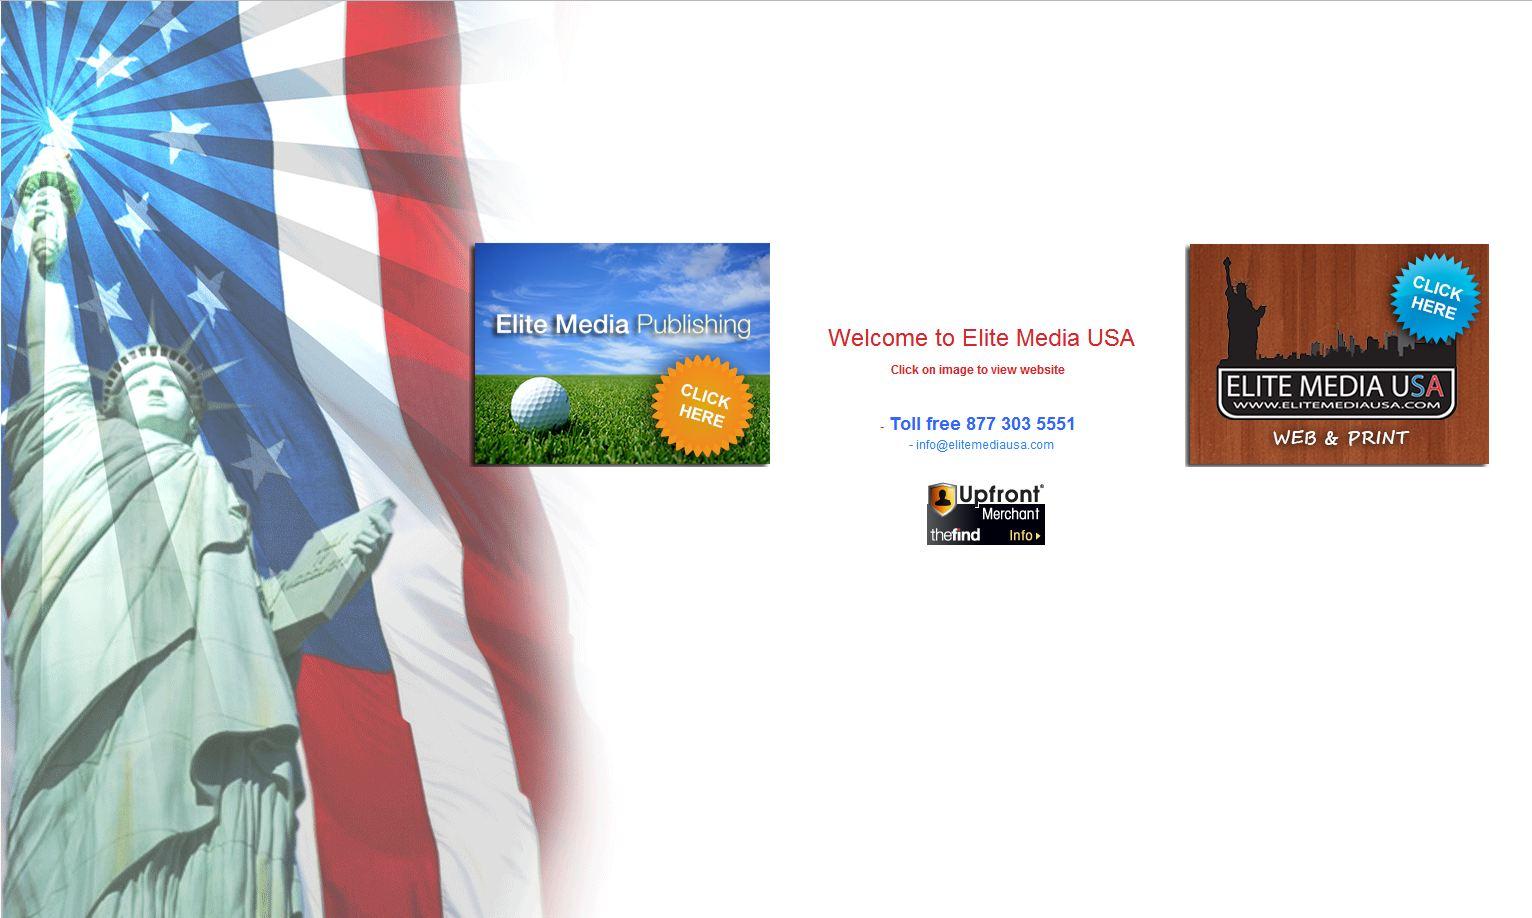 Elite Media USA